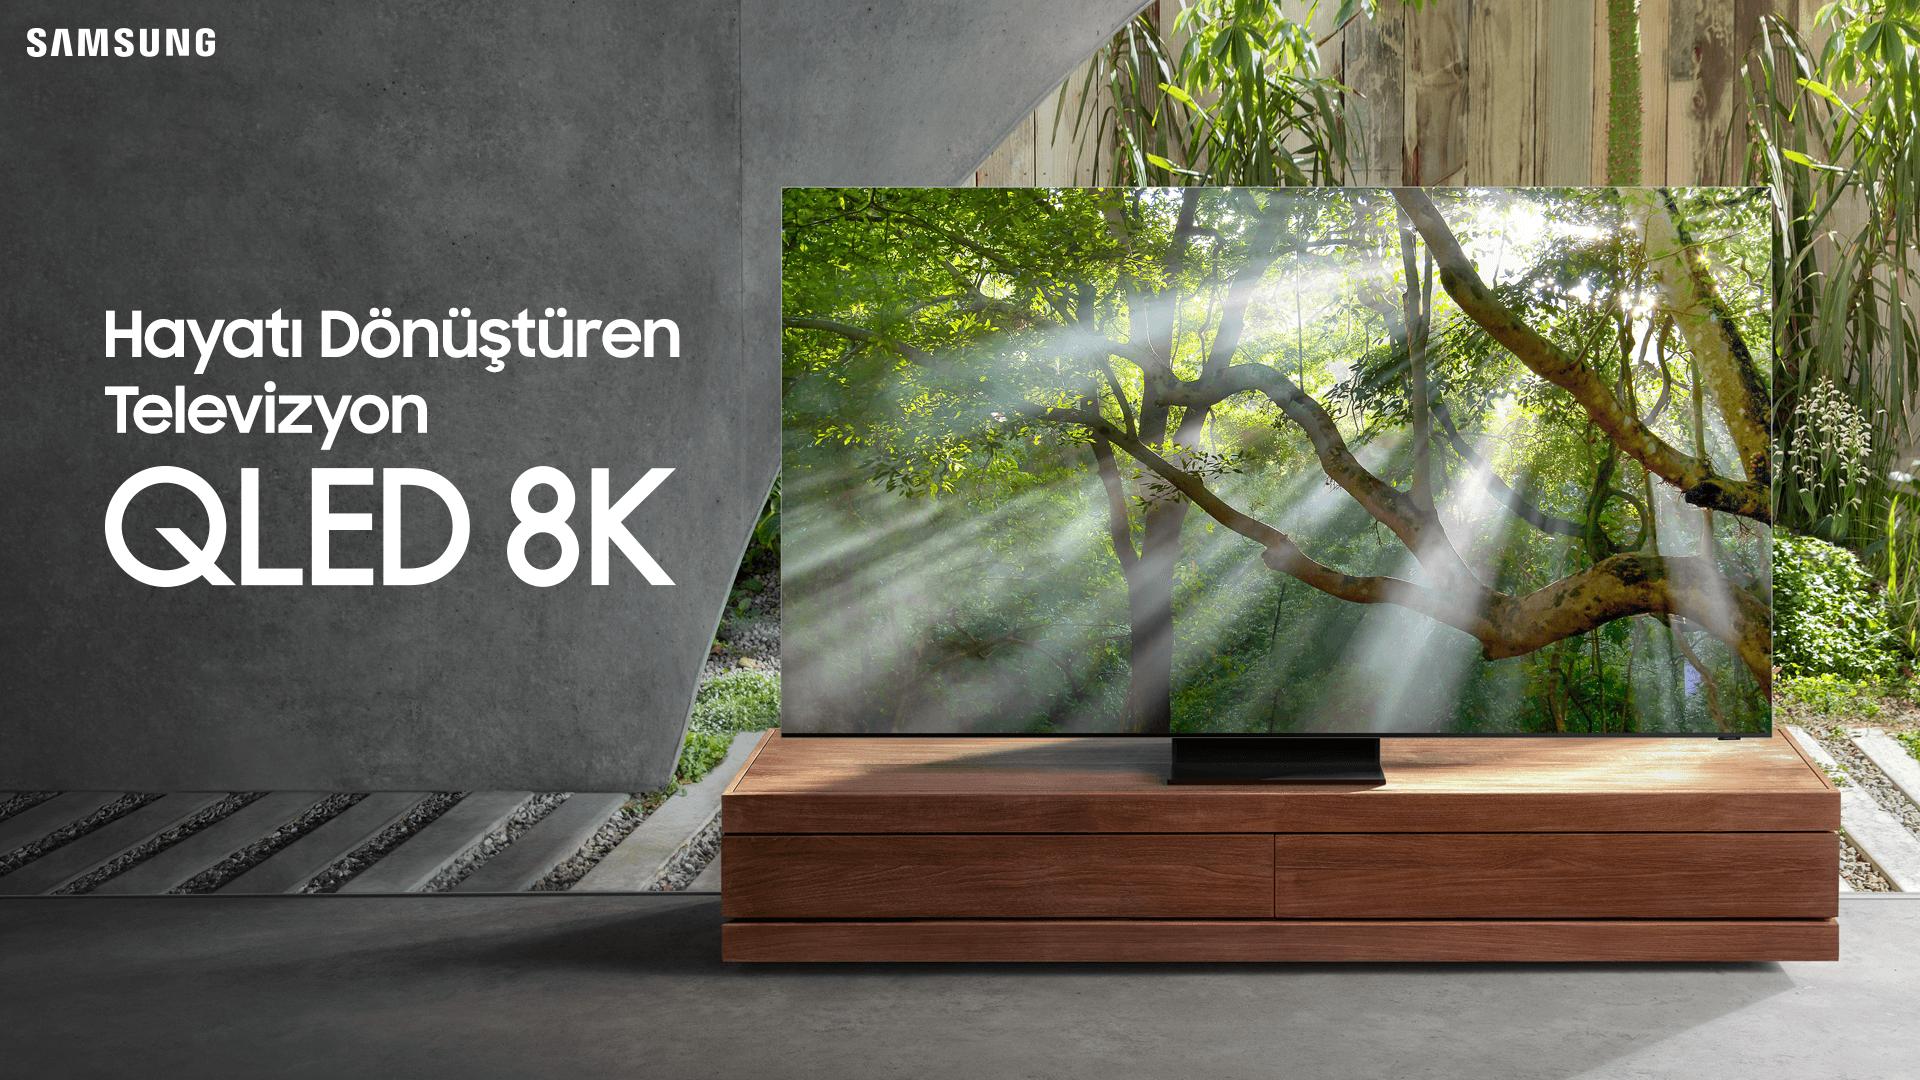 Samsung Q950T QLED 8K Smart TV Tanıtıldı